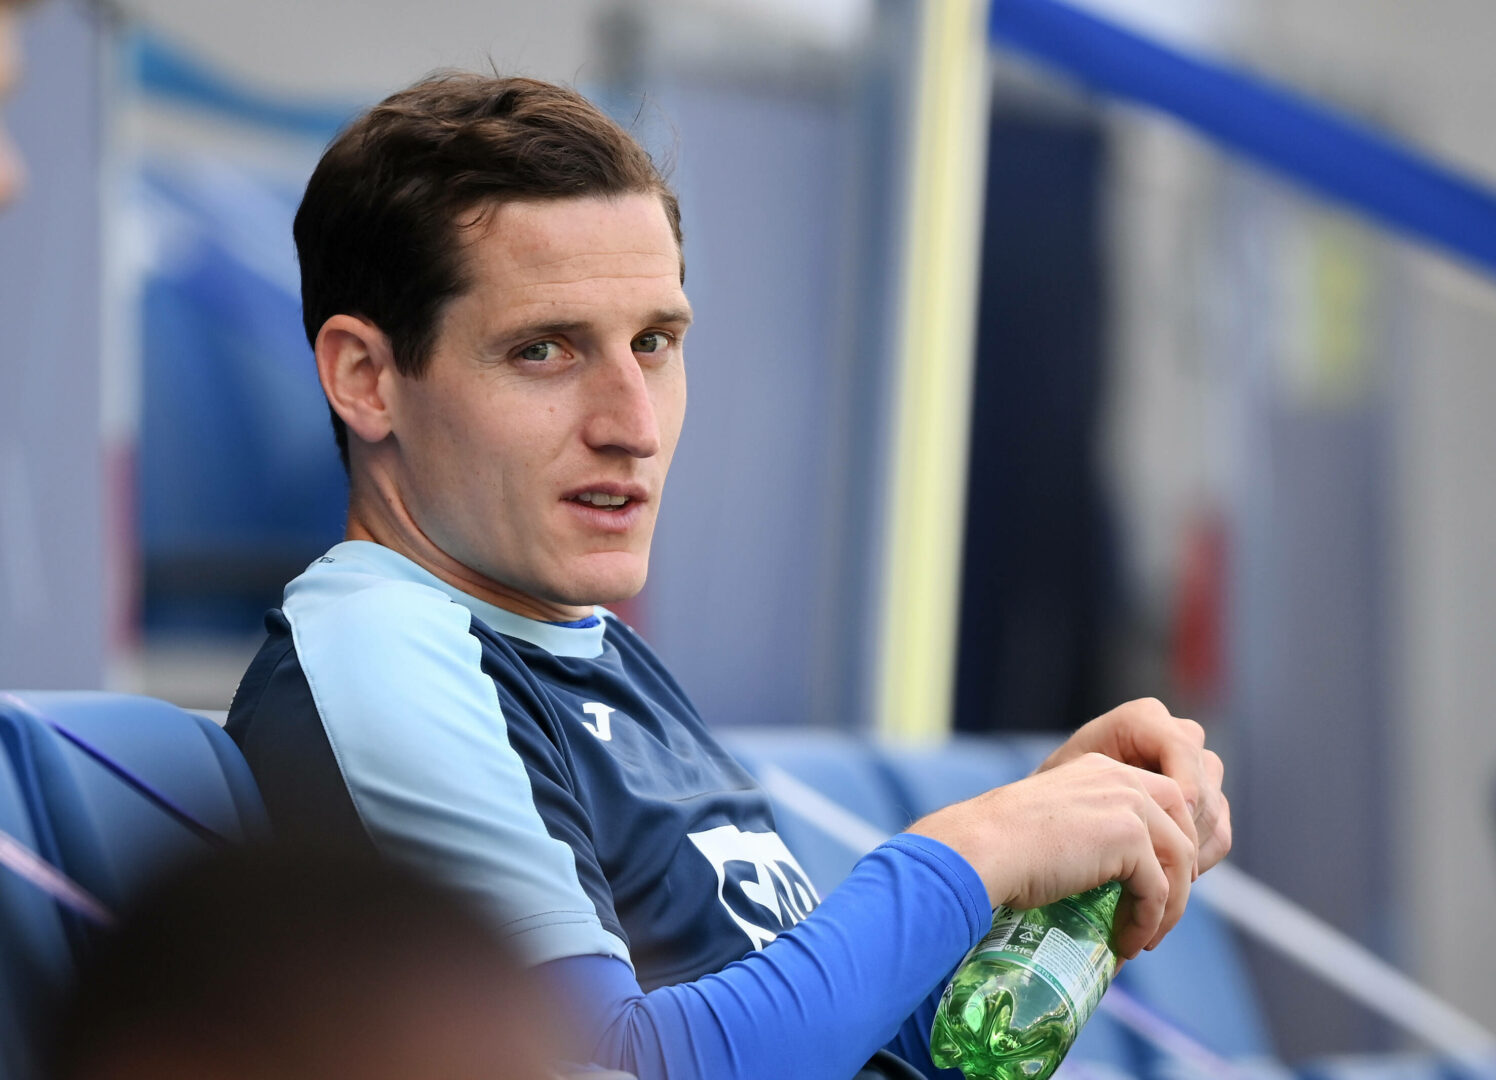 Bestätigt: TSG Hoffenheim bindet Sebastian Rudy fest